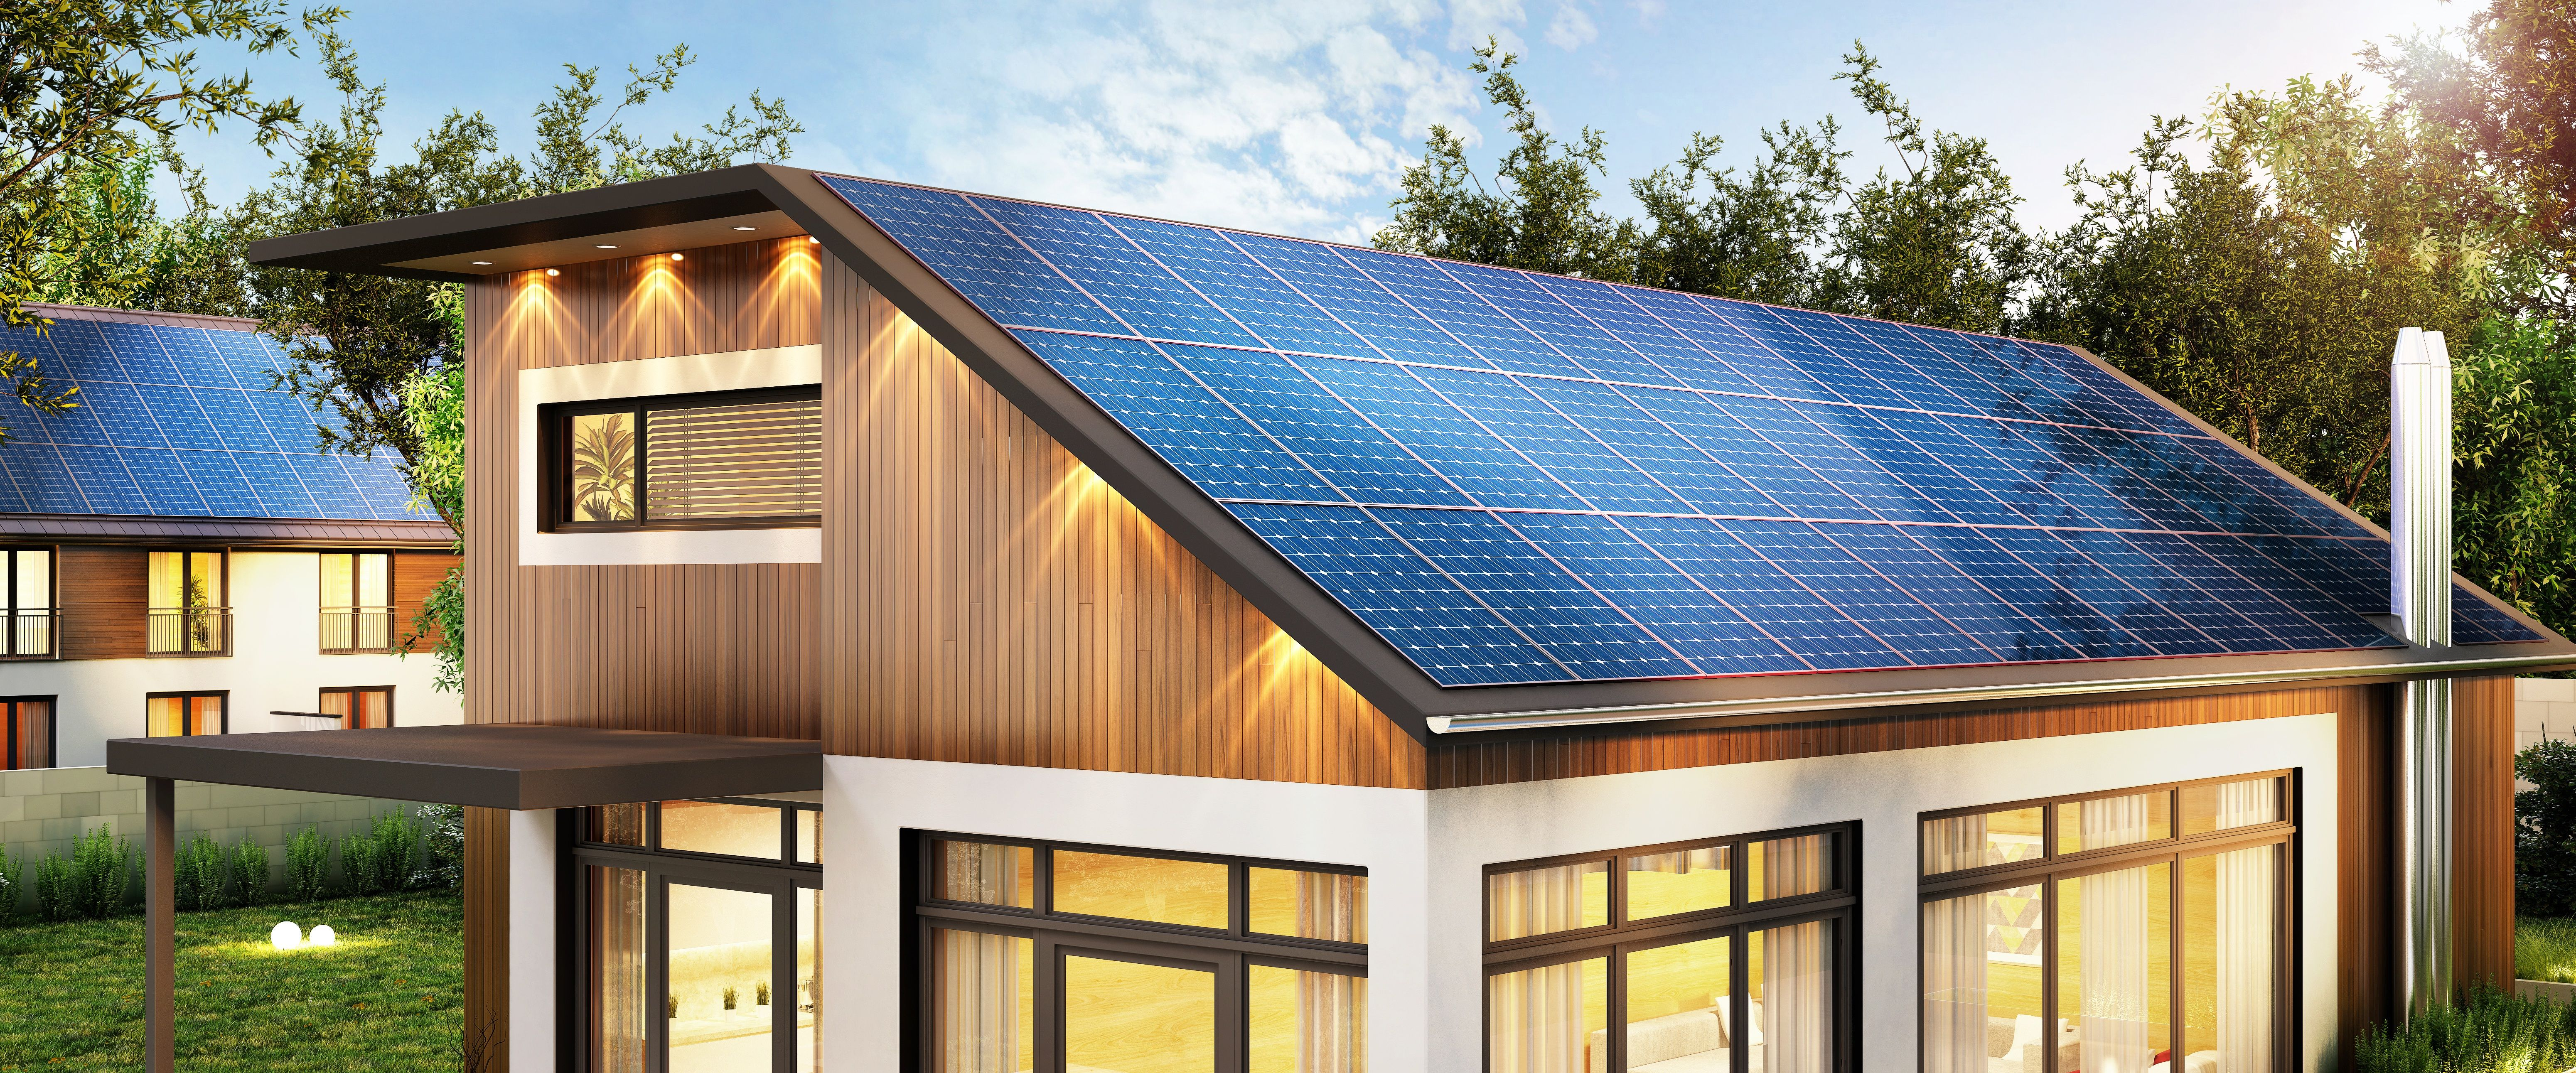 Solar Panel Cost Are Home Solar Panels Worth The Cost The Moneypit Best Solar Panels Solar Panel Cost Solar Panels